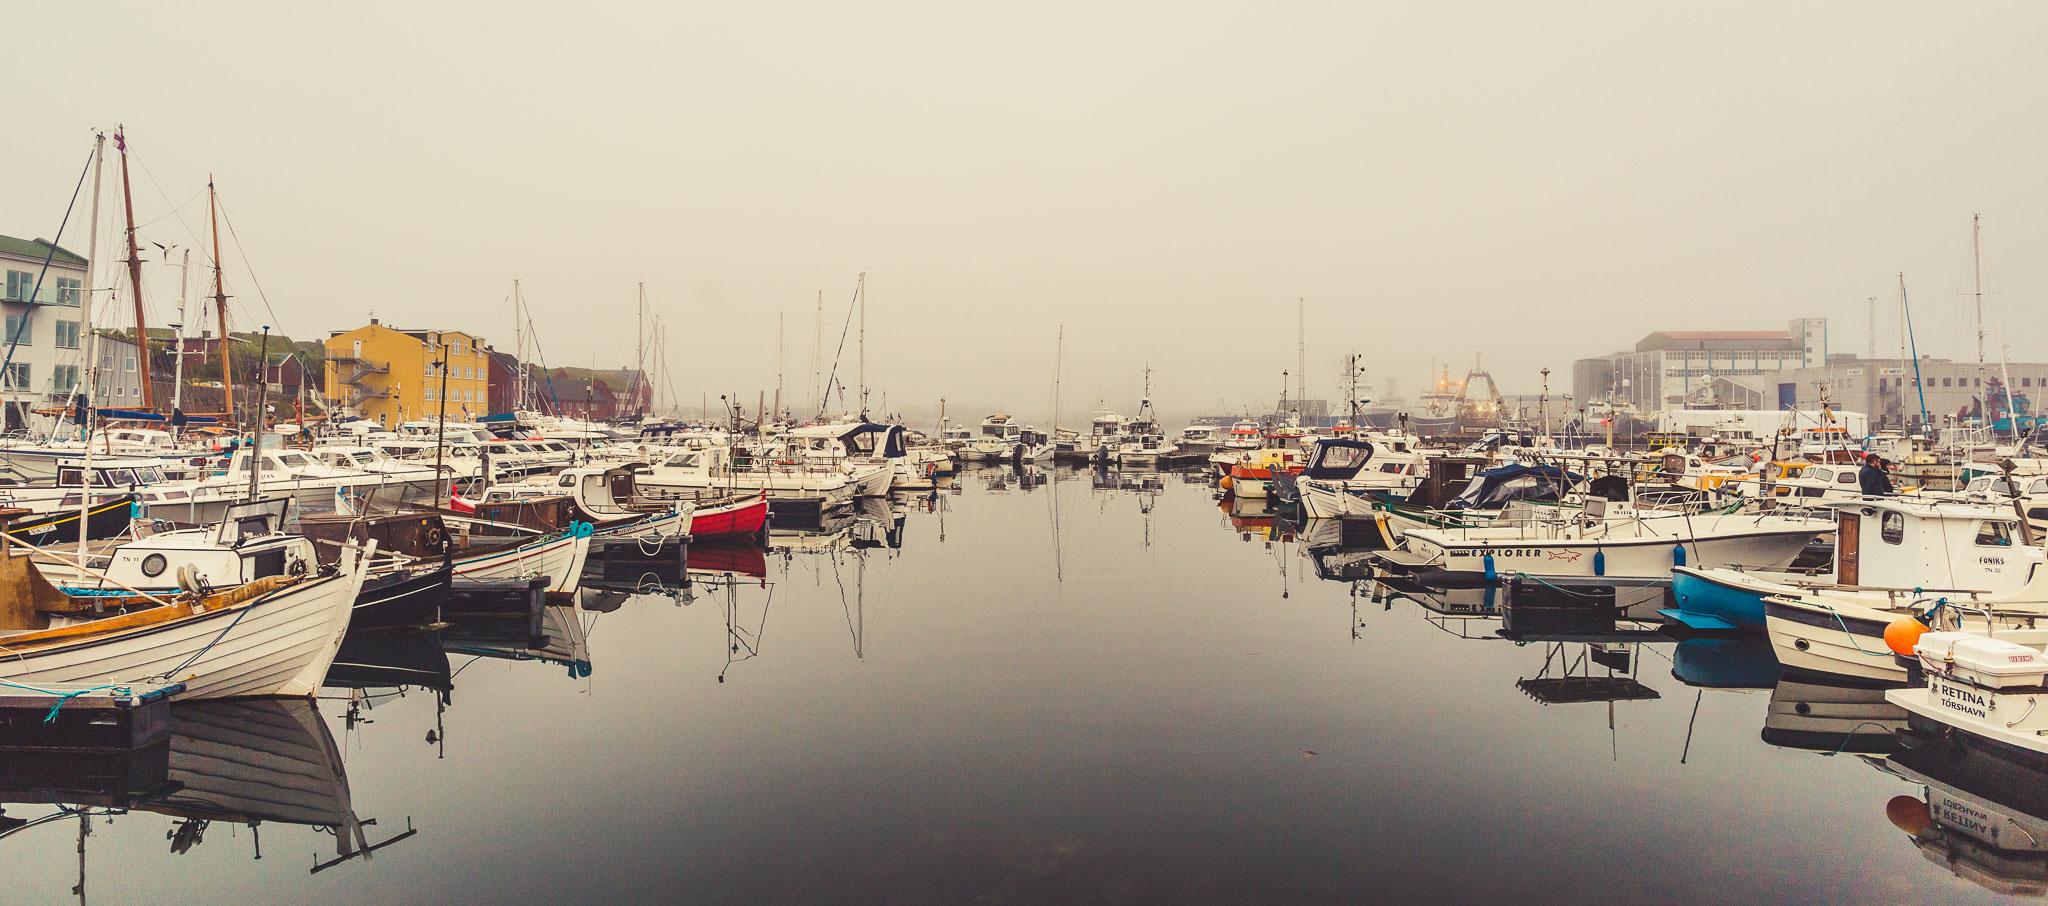 Toshavn Port Capital